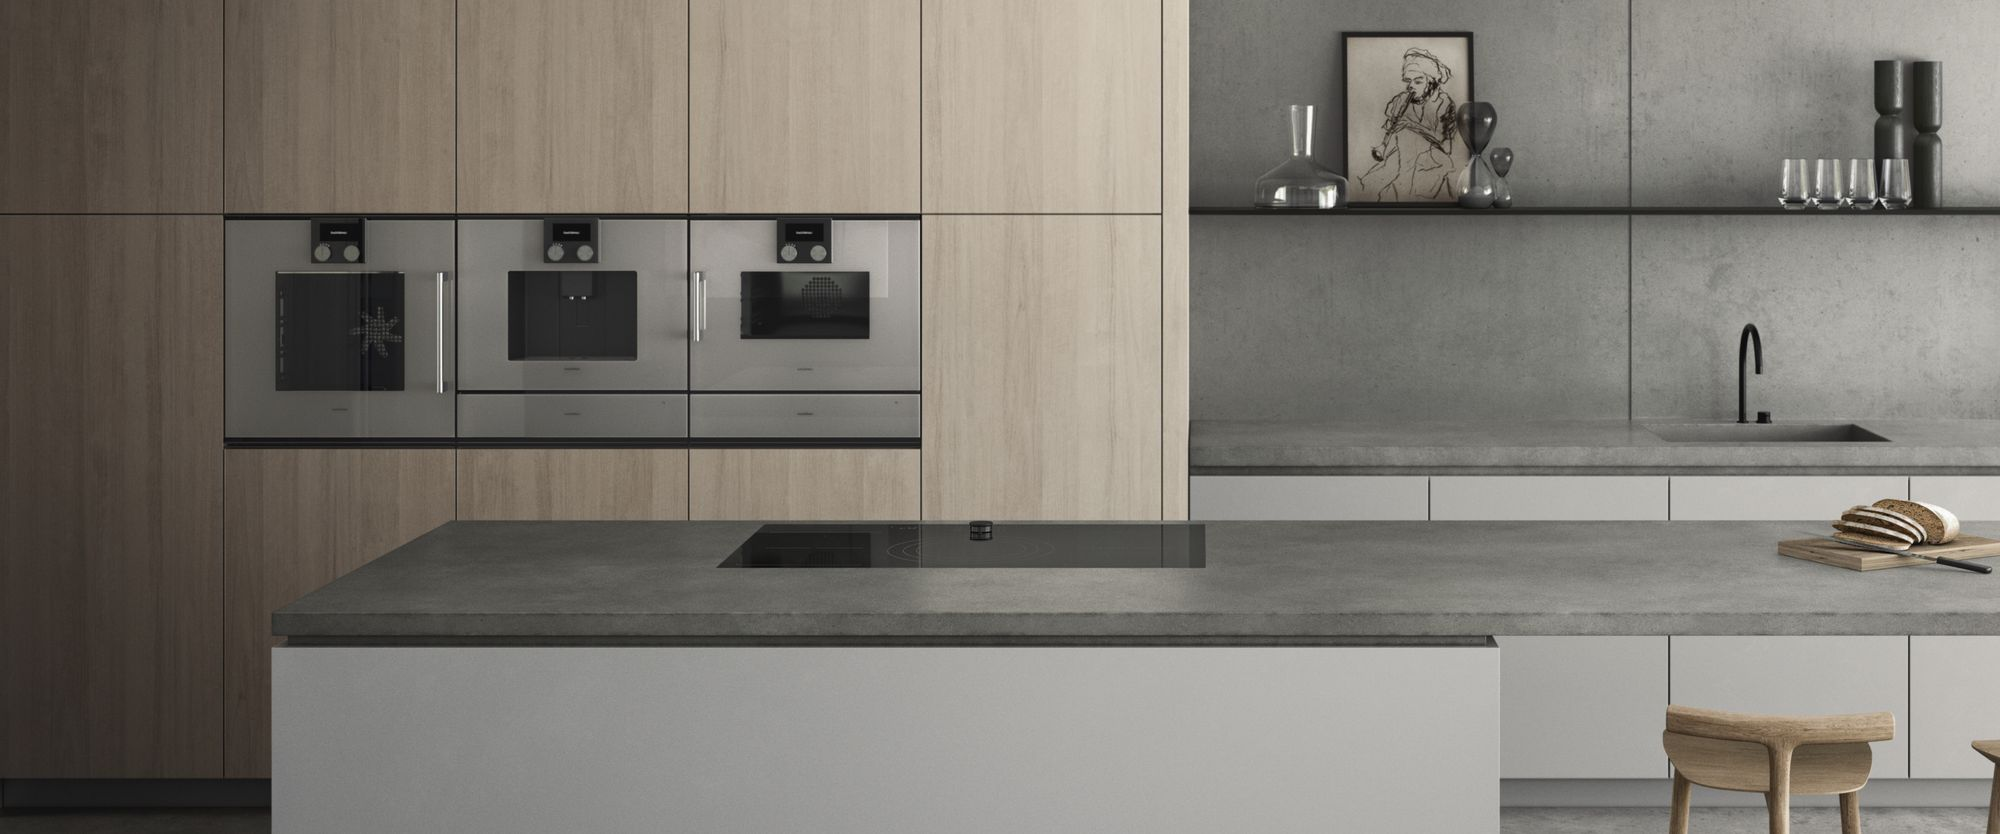 Gaggenau apparatuur 200 serie #gaggenau #oven #bakoven #koffievolautomaat #inbouwapparatuur #keukenapparaten #keuken